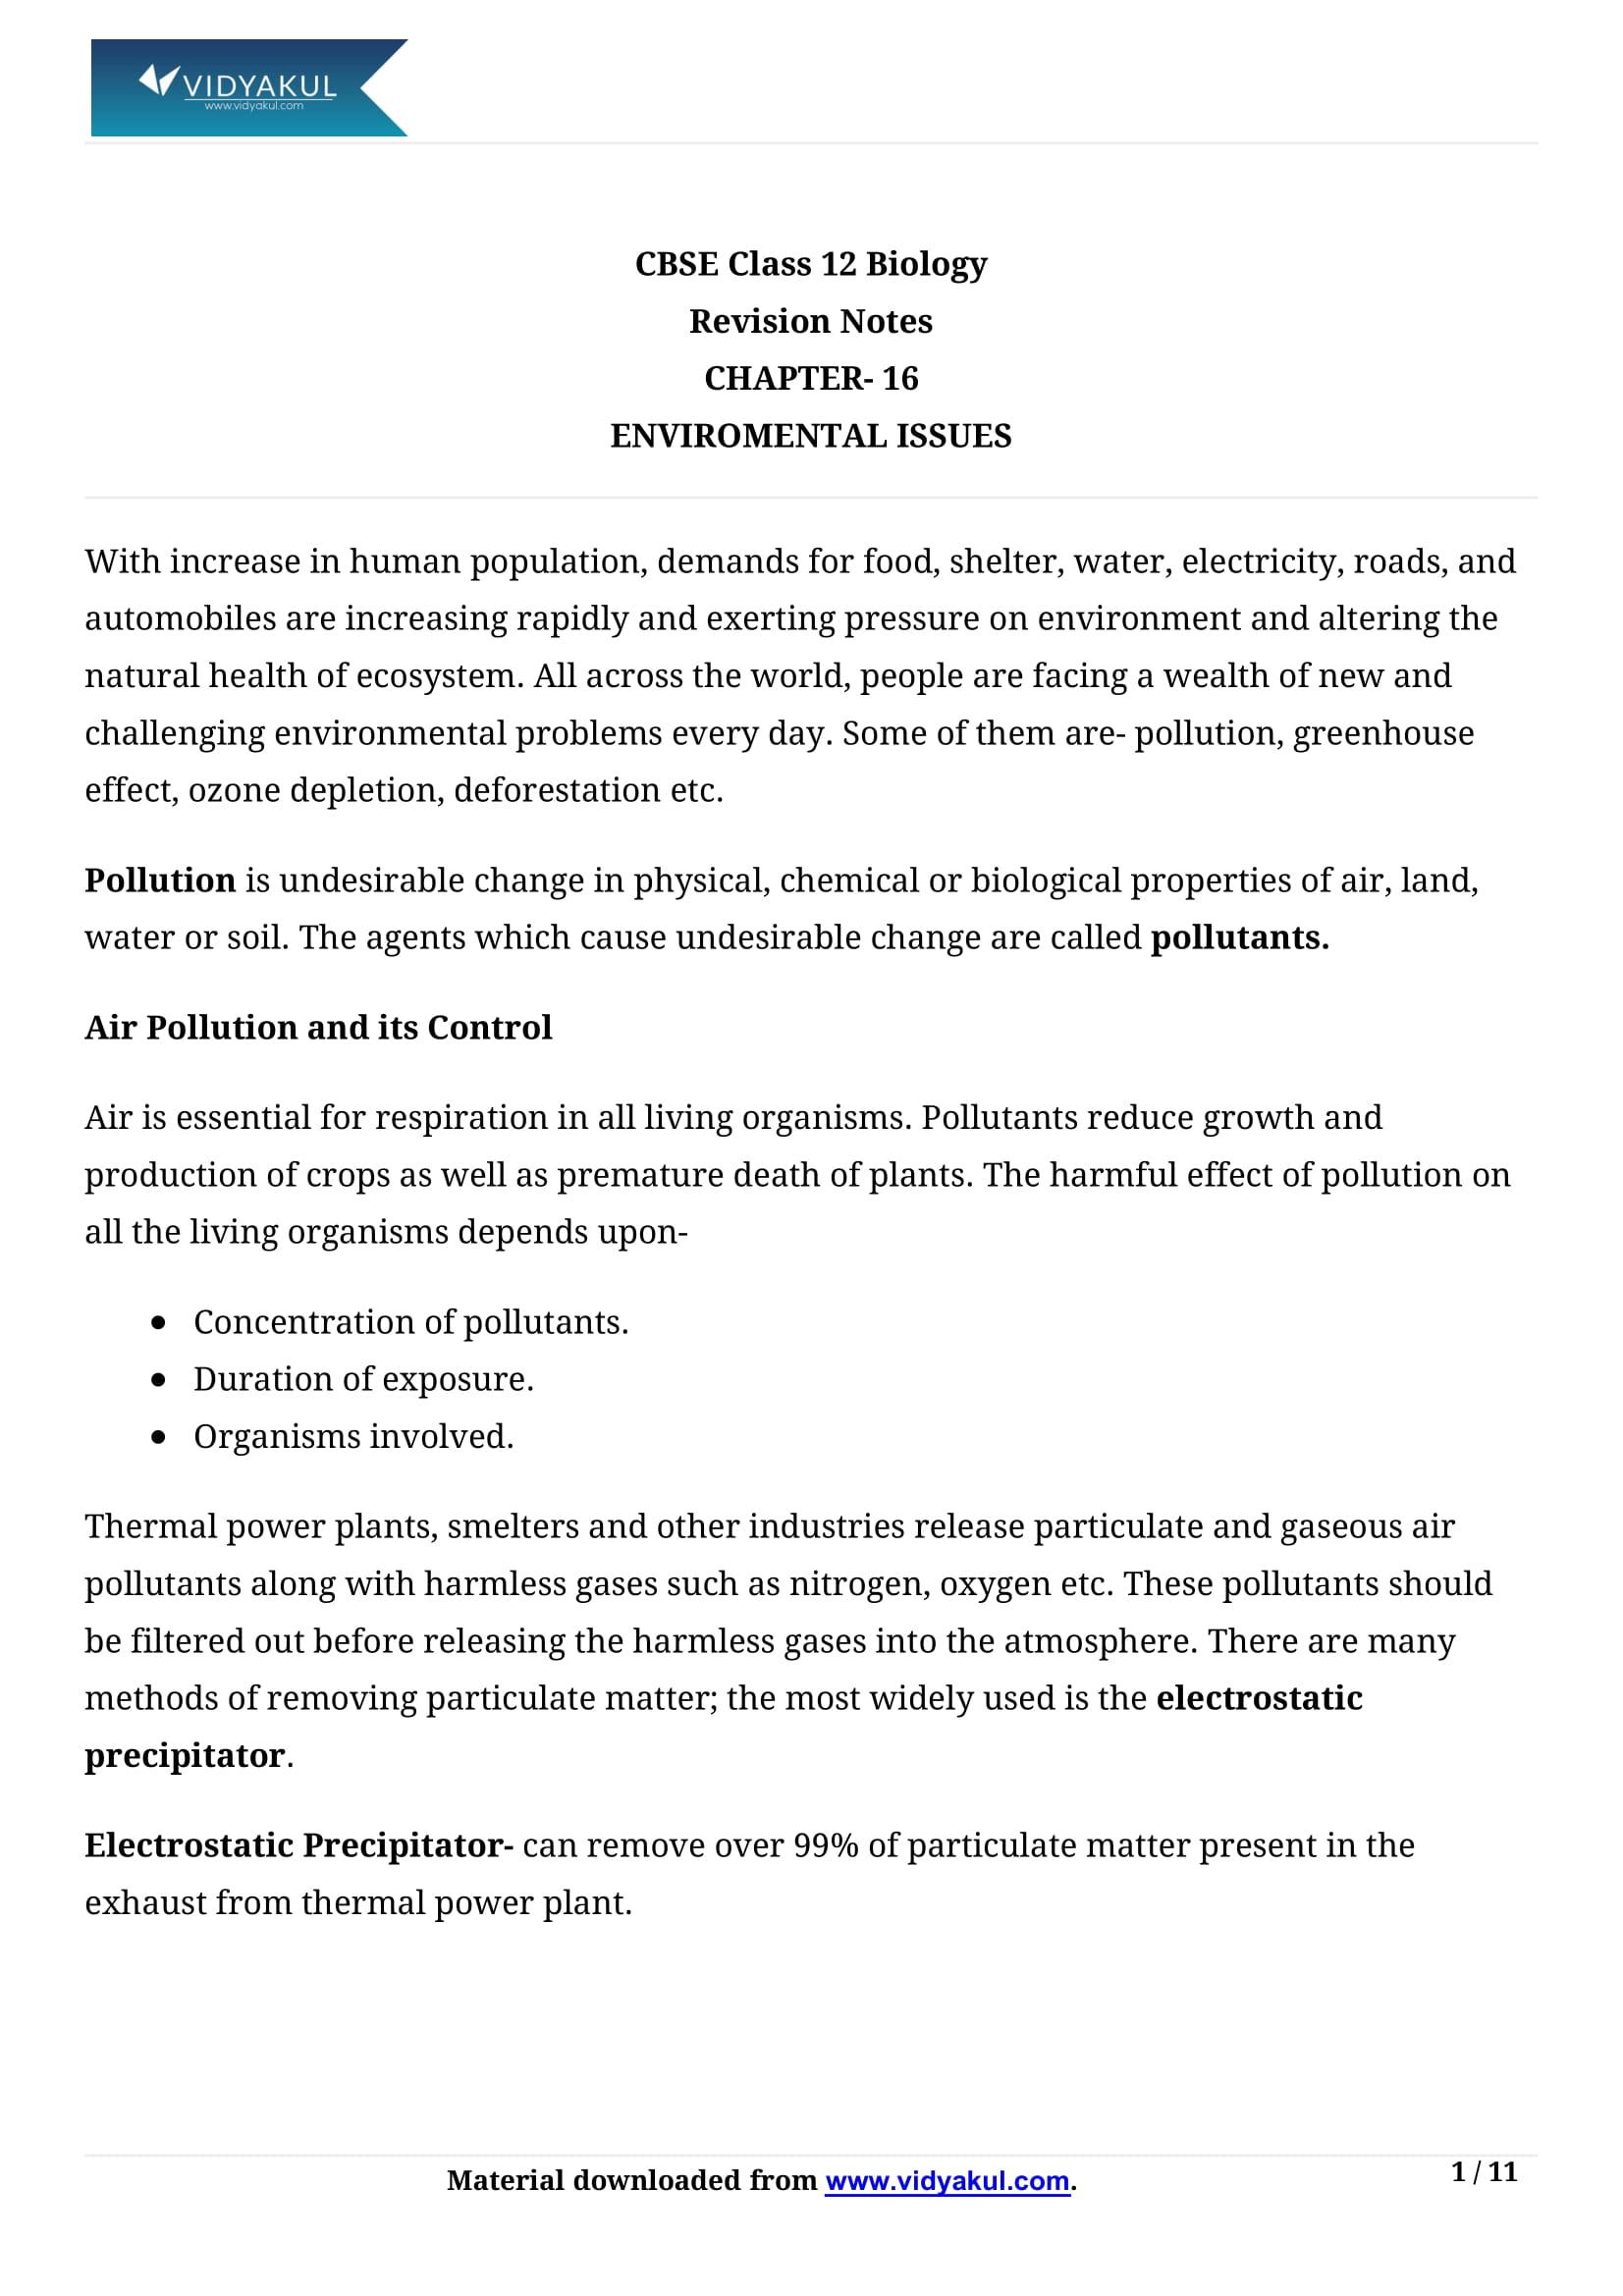 Environmental Issues Class 12 Notes | Vidyakul